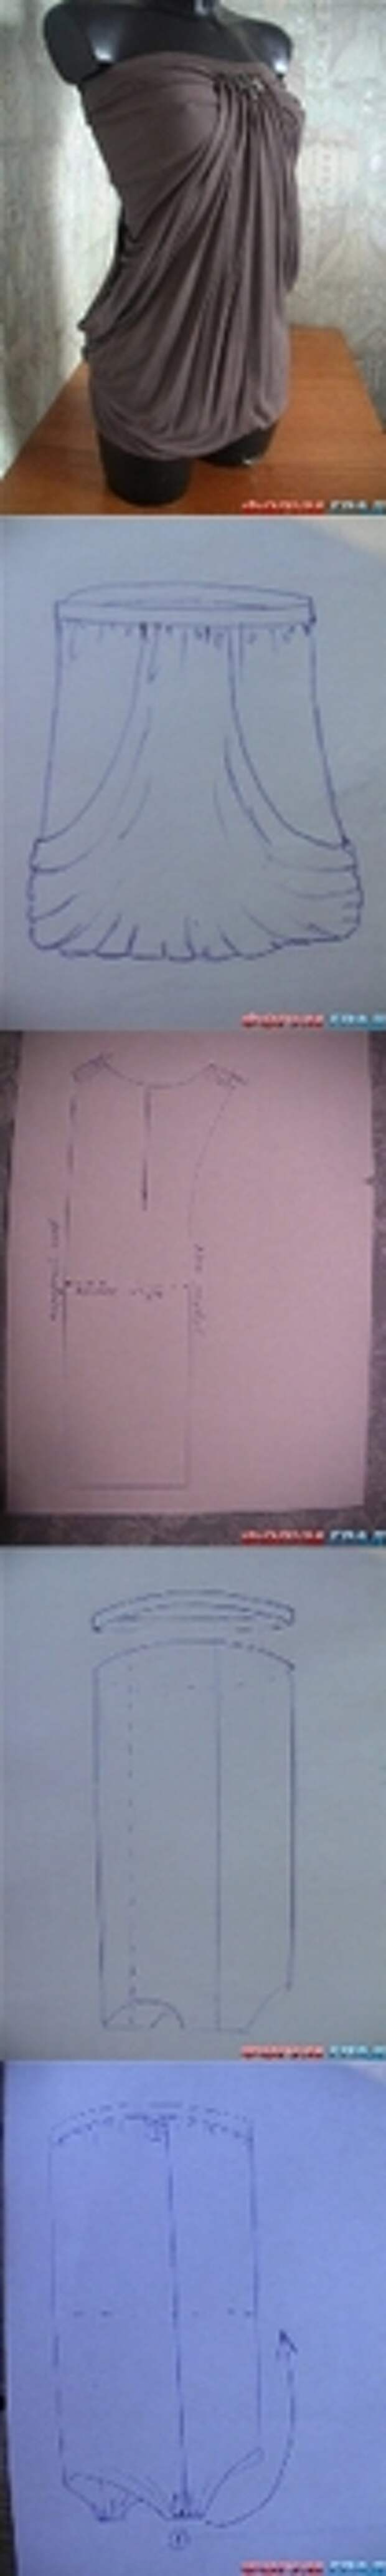 0273d9e17978f36a8772ef23cc6e2398 (105x700, 49Kb)